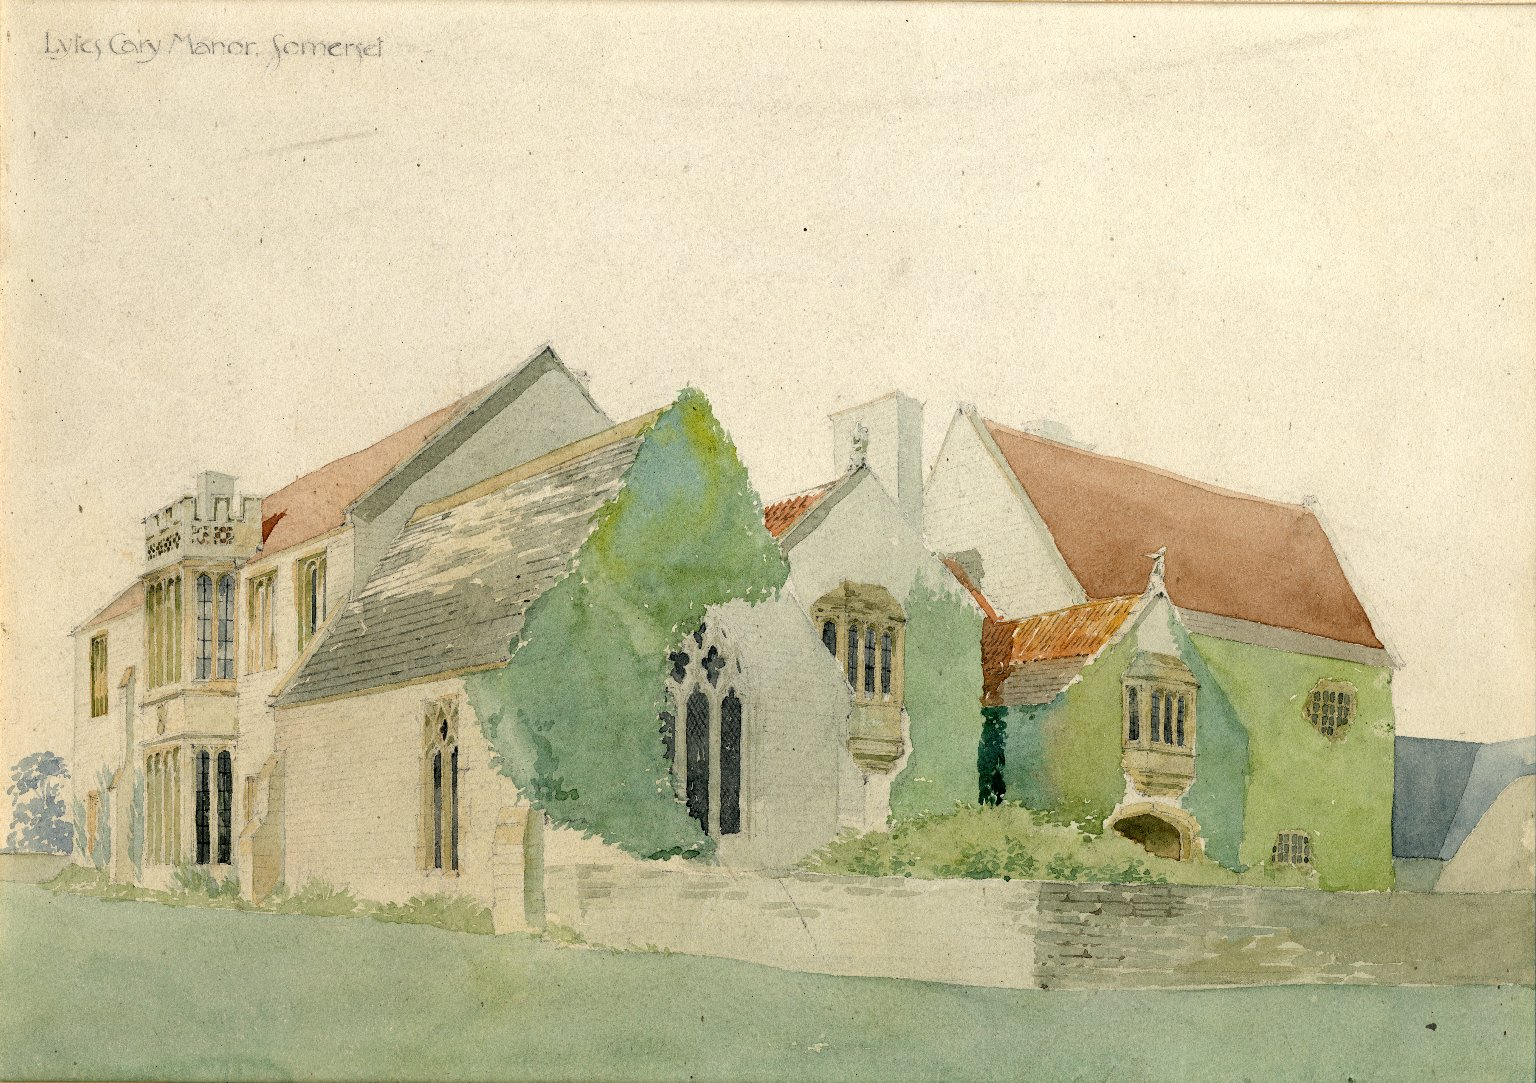 Lytes Cary Manor, Somerset